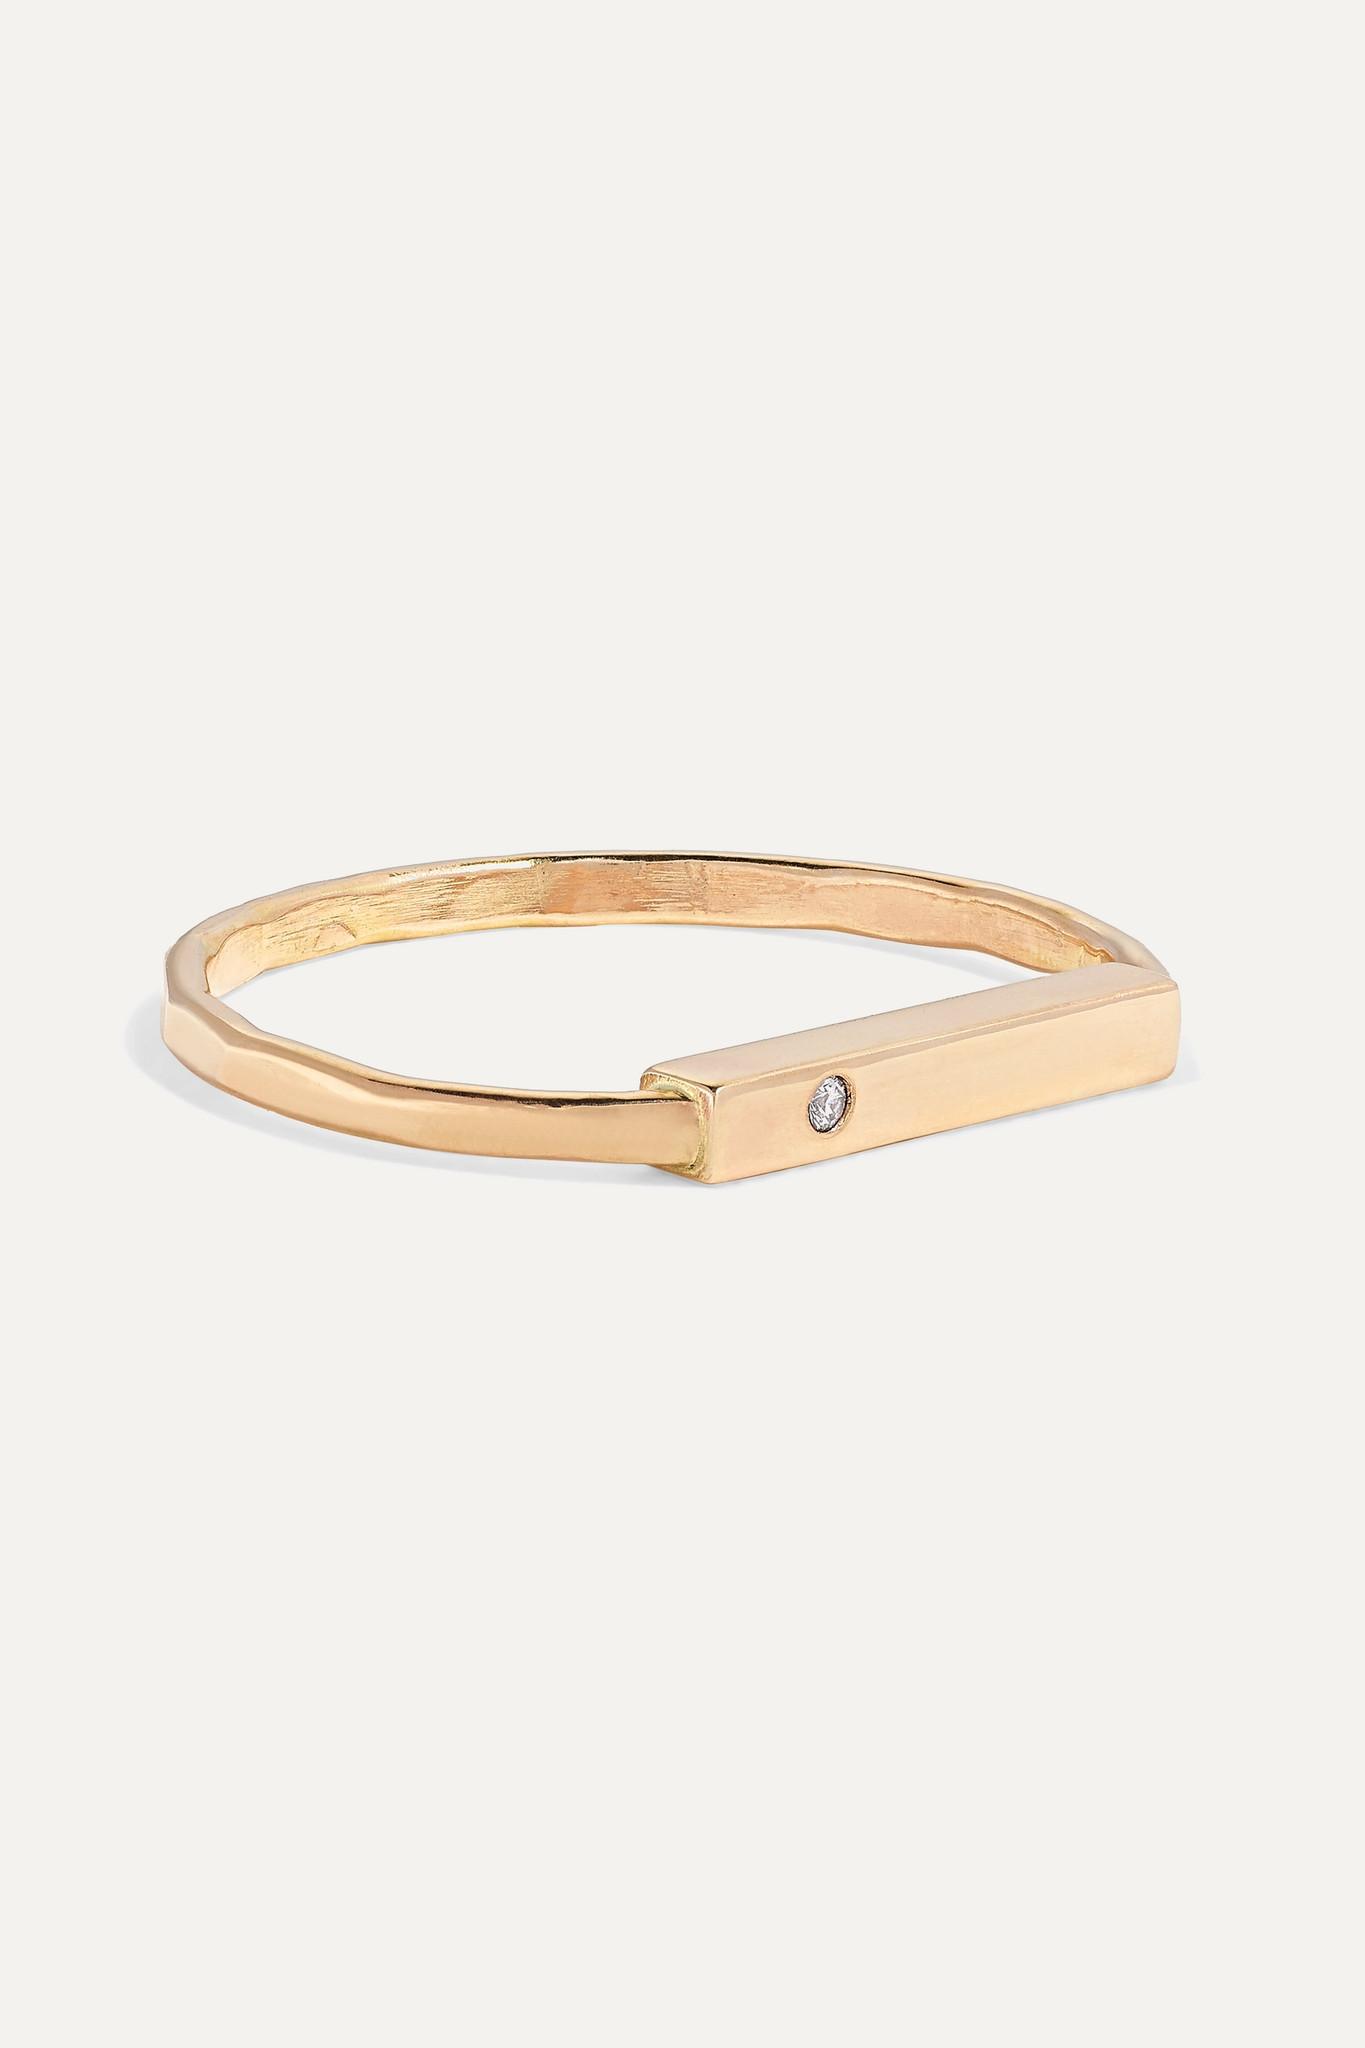 MELISSA JOY MANNING - 【net Sustain】14k 黄金钻石戒指 - 金色 - 5